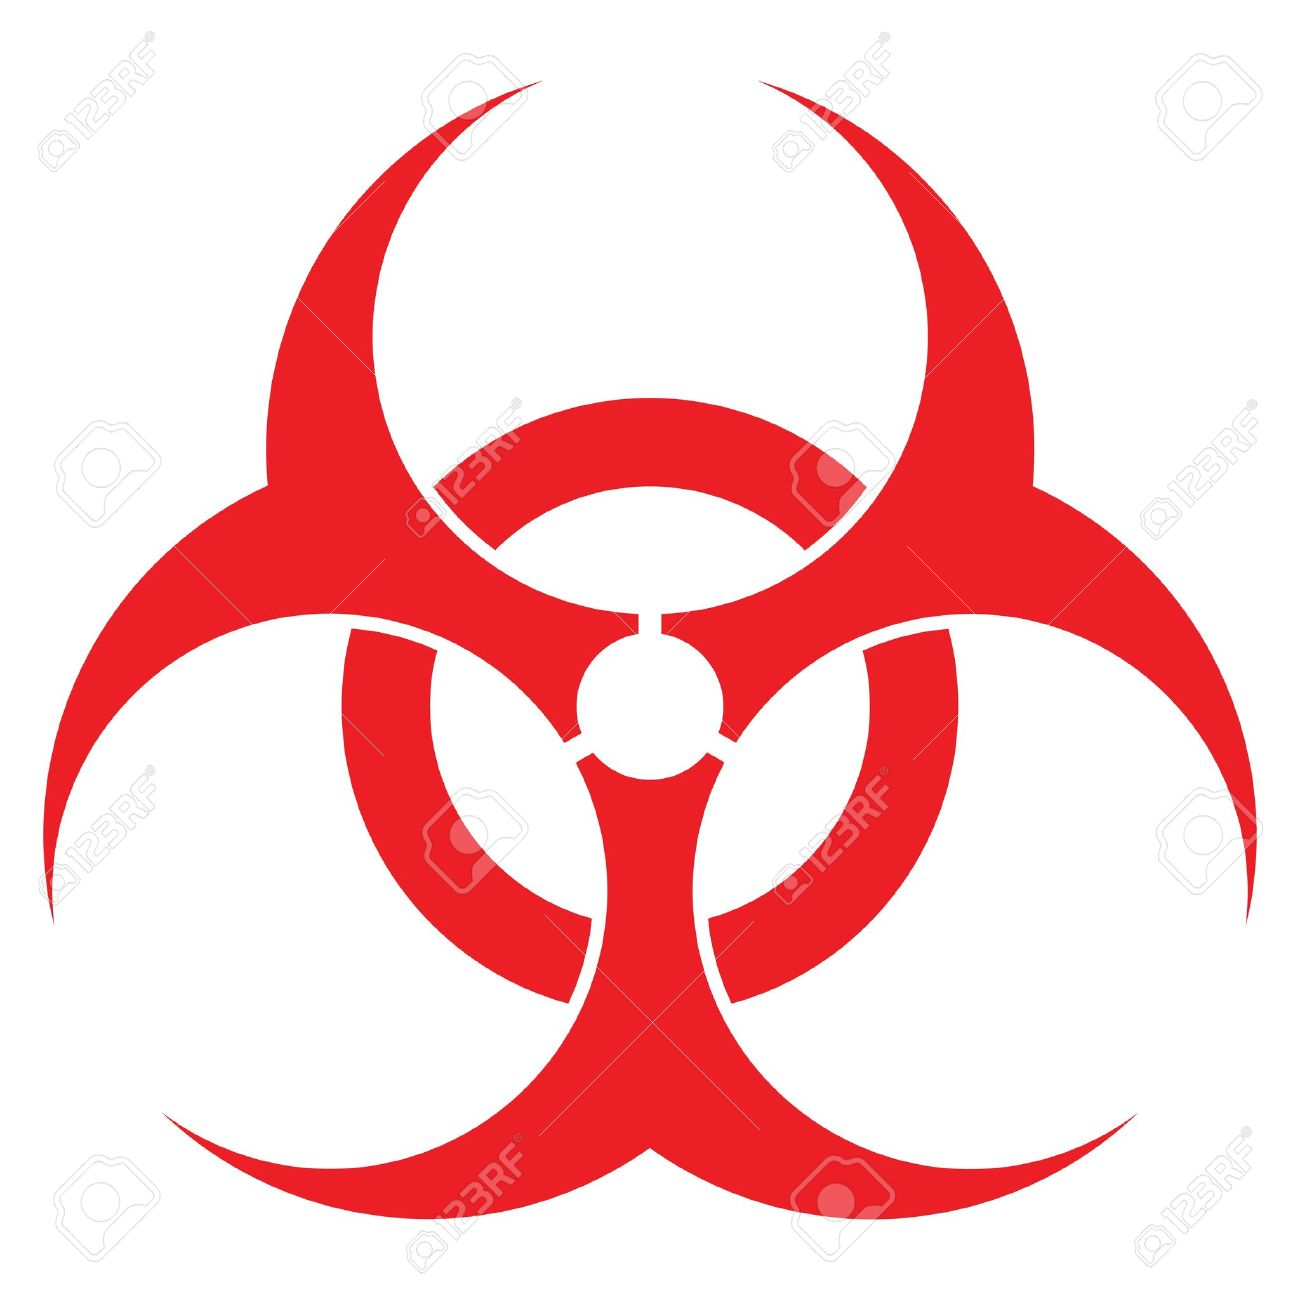 biohazard sign vector format for health industry concepts royalty rh 123rf com biohazard vector download biohazard vector free